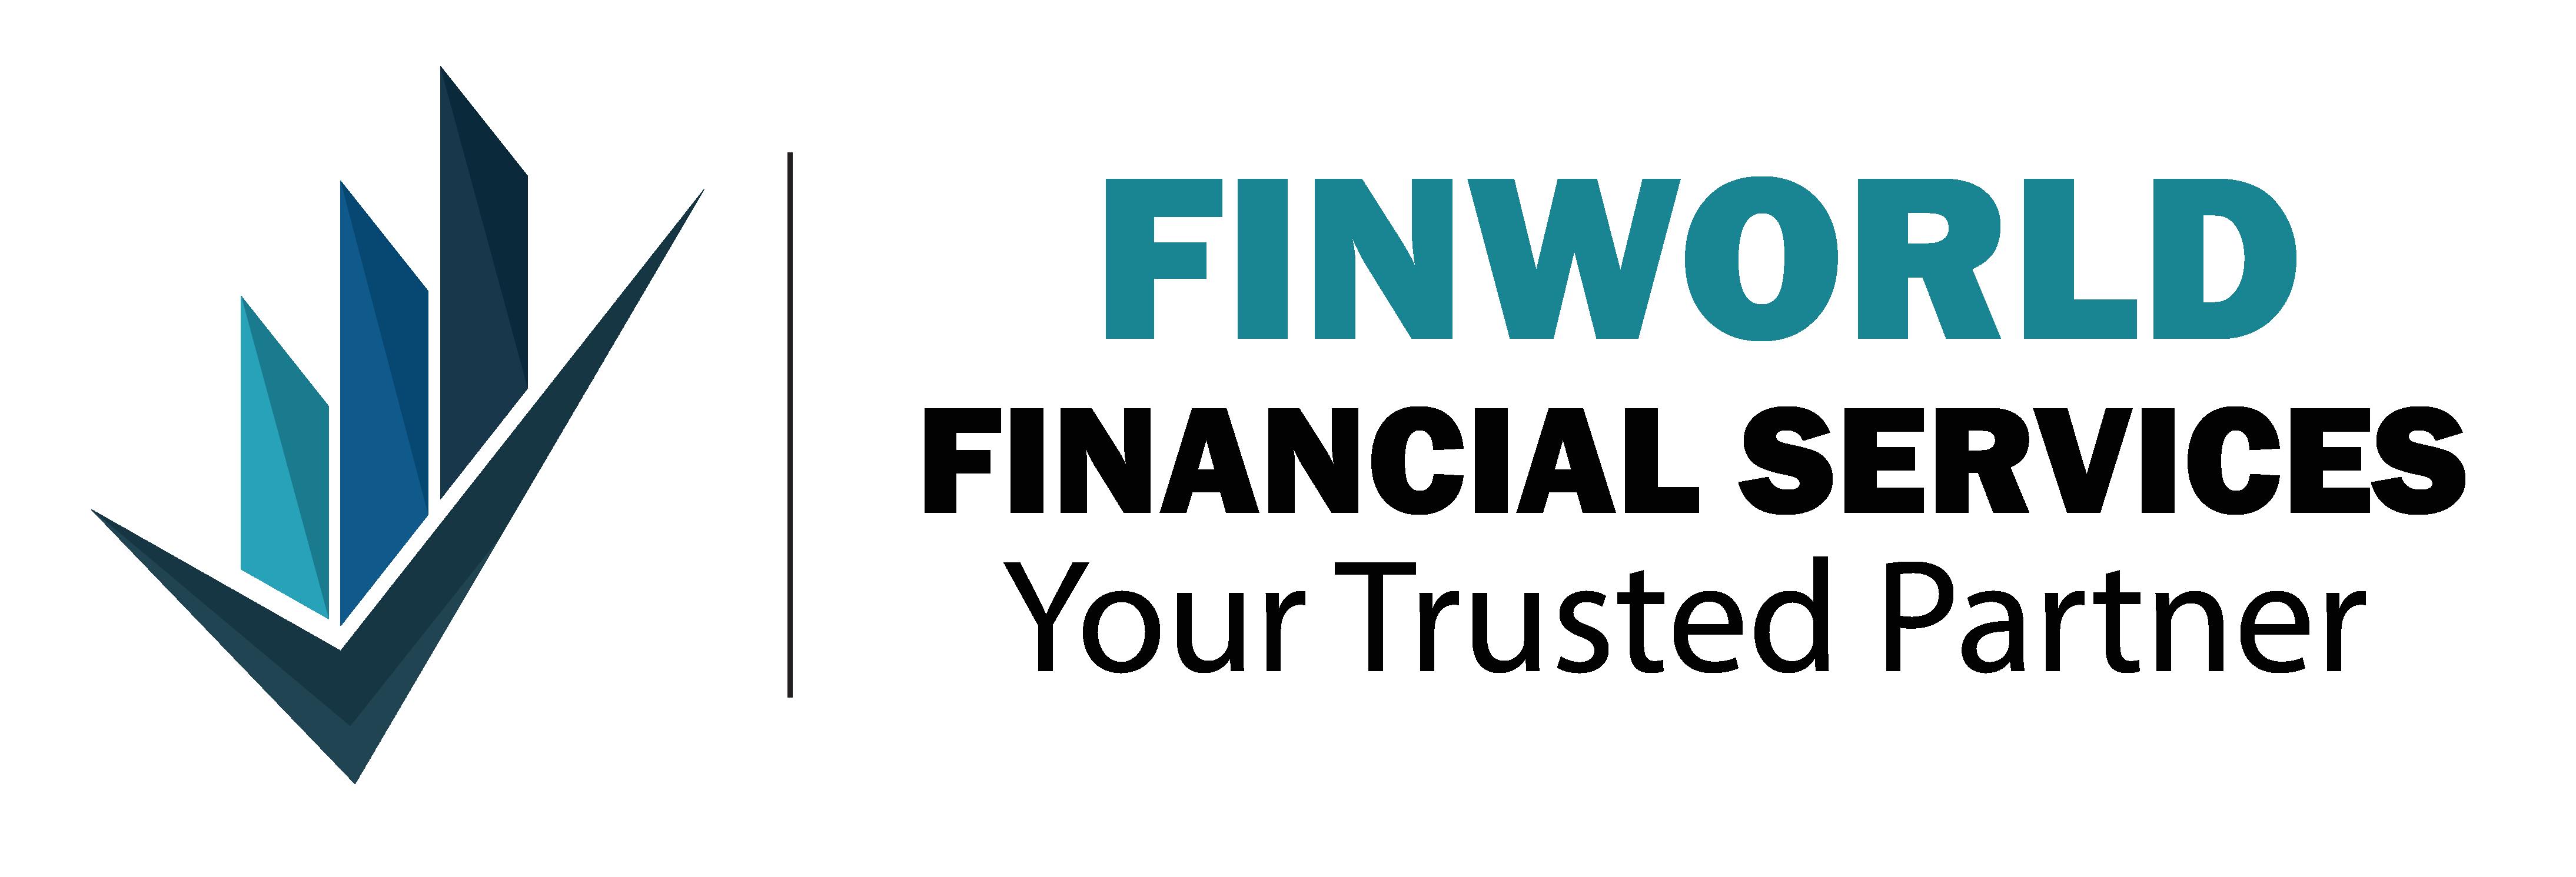 FinWorld Financial Services